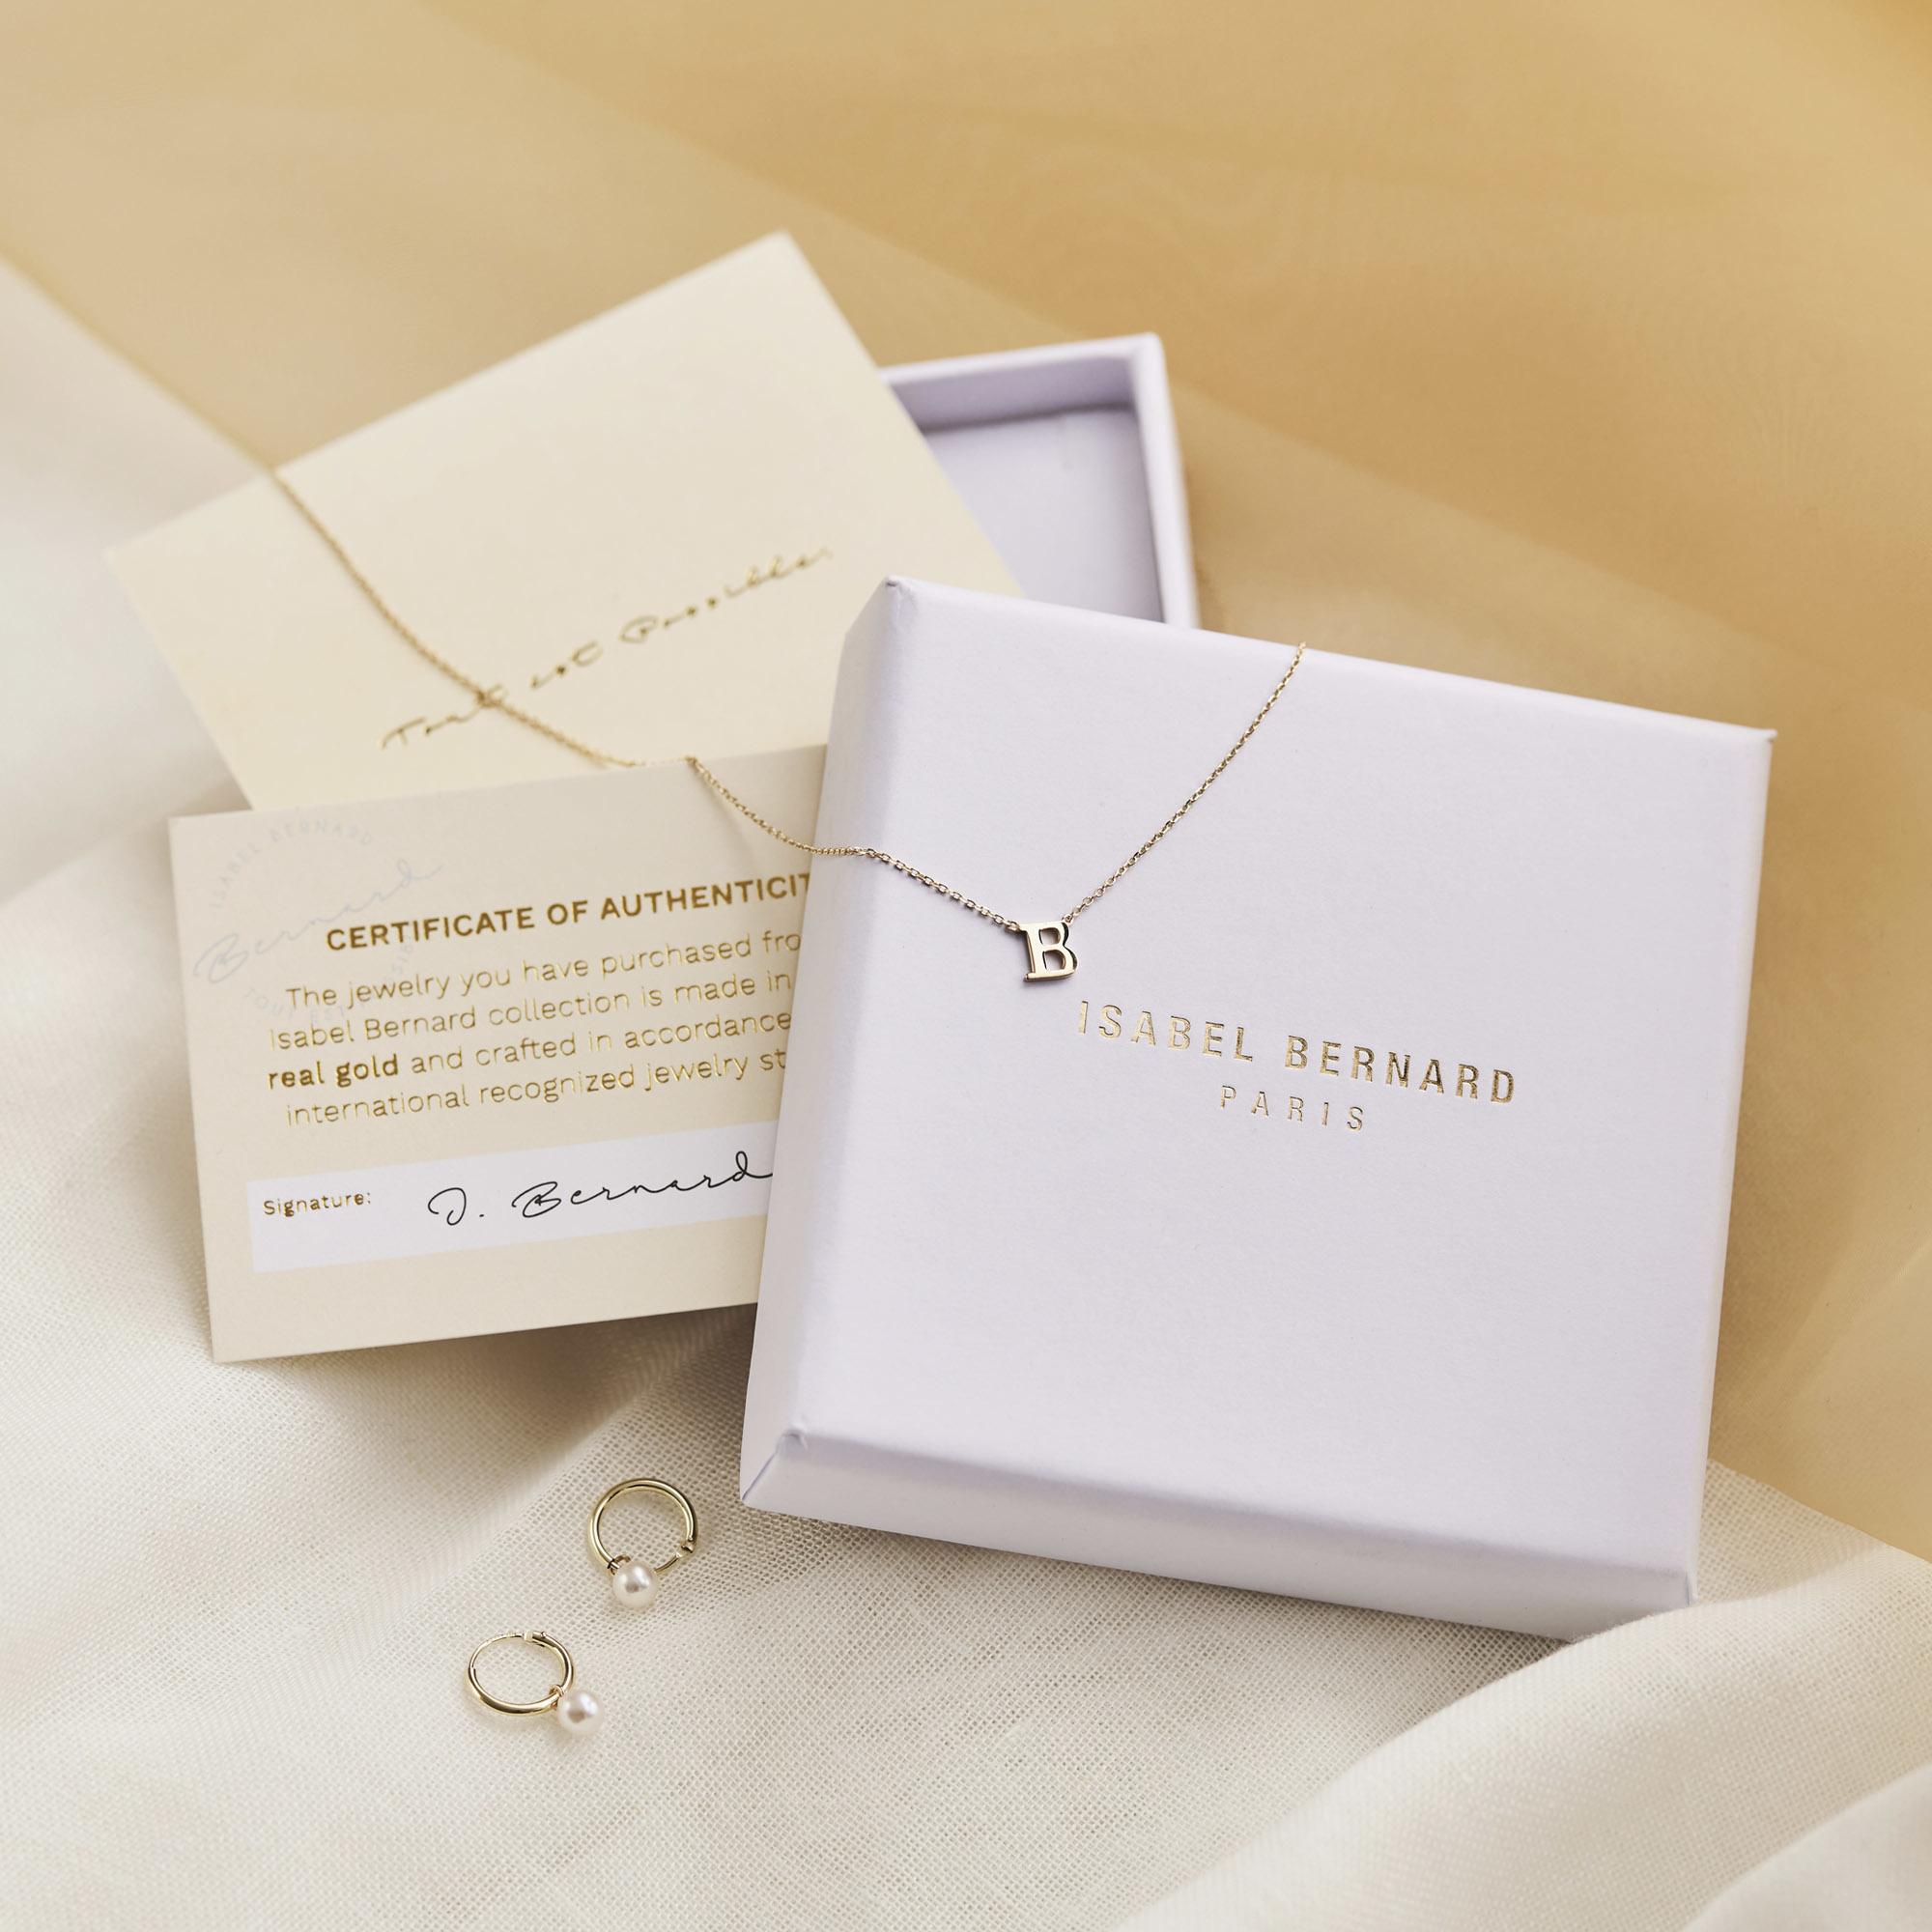 Isabel Bernard La Concorde Louane 14 karat rose gold bracelet with circles